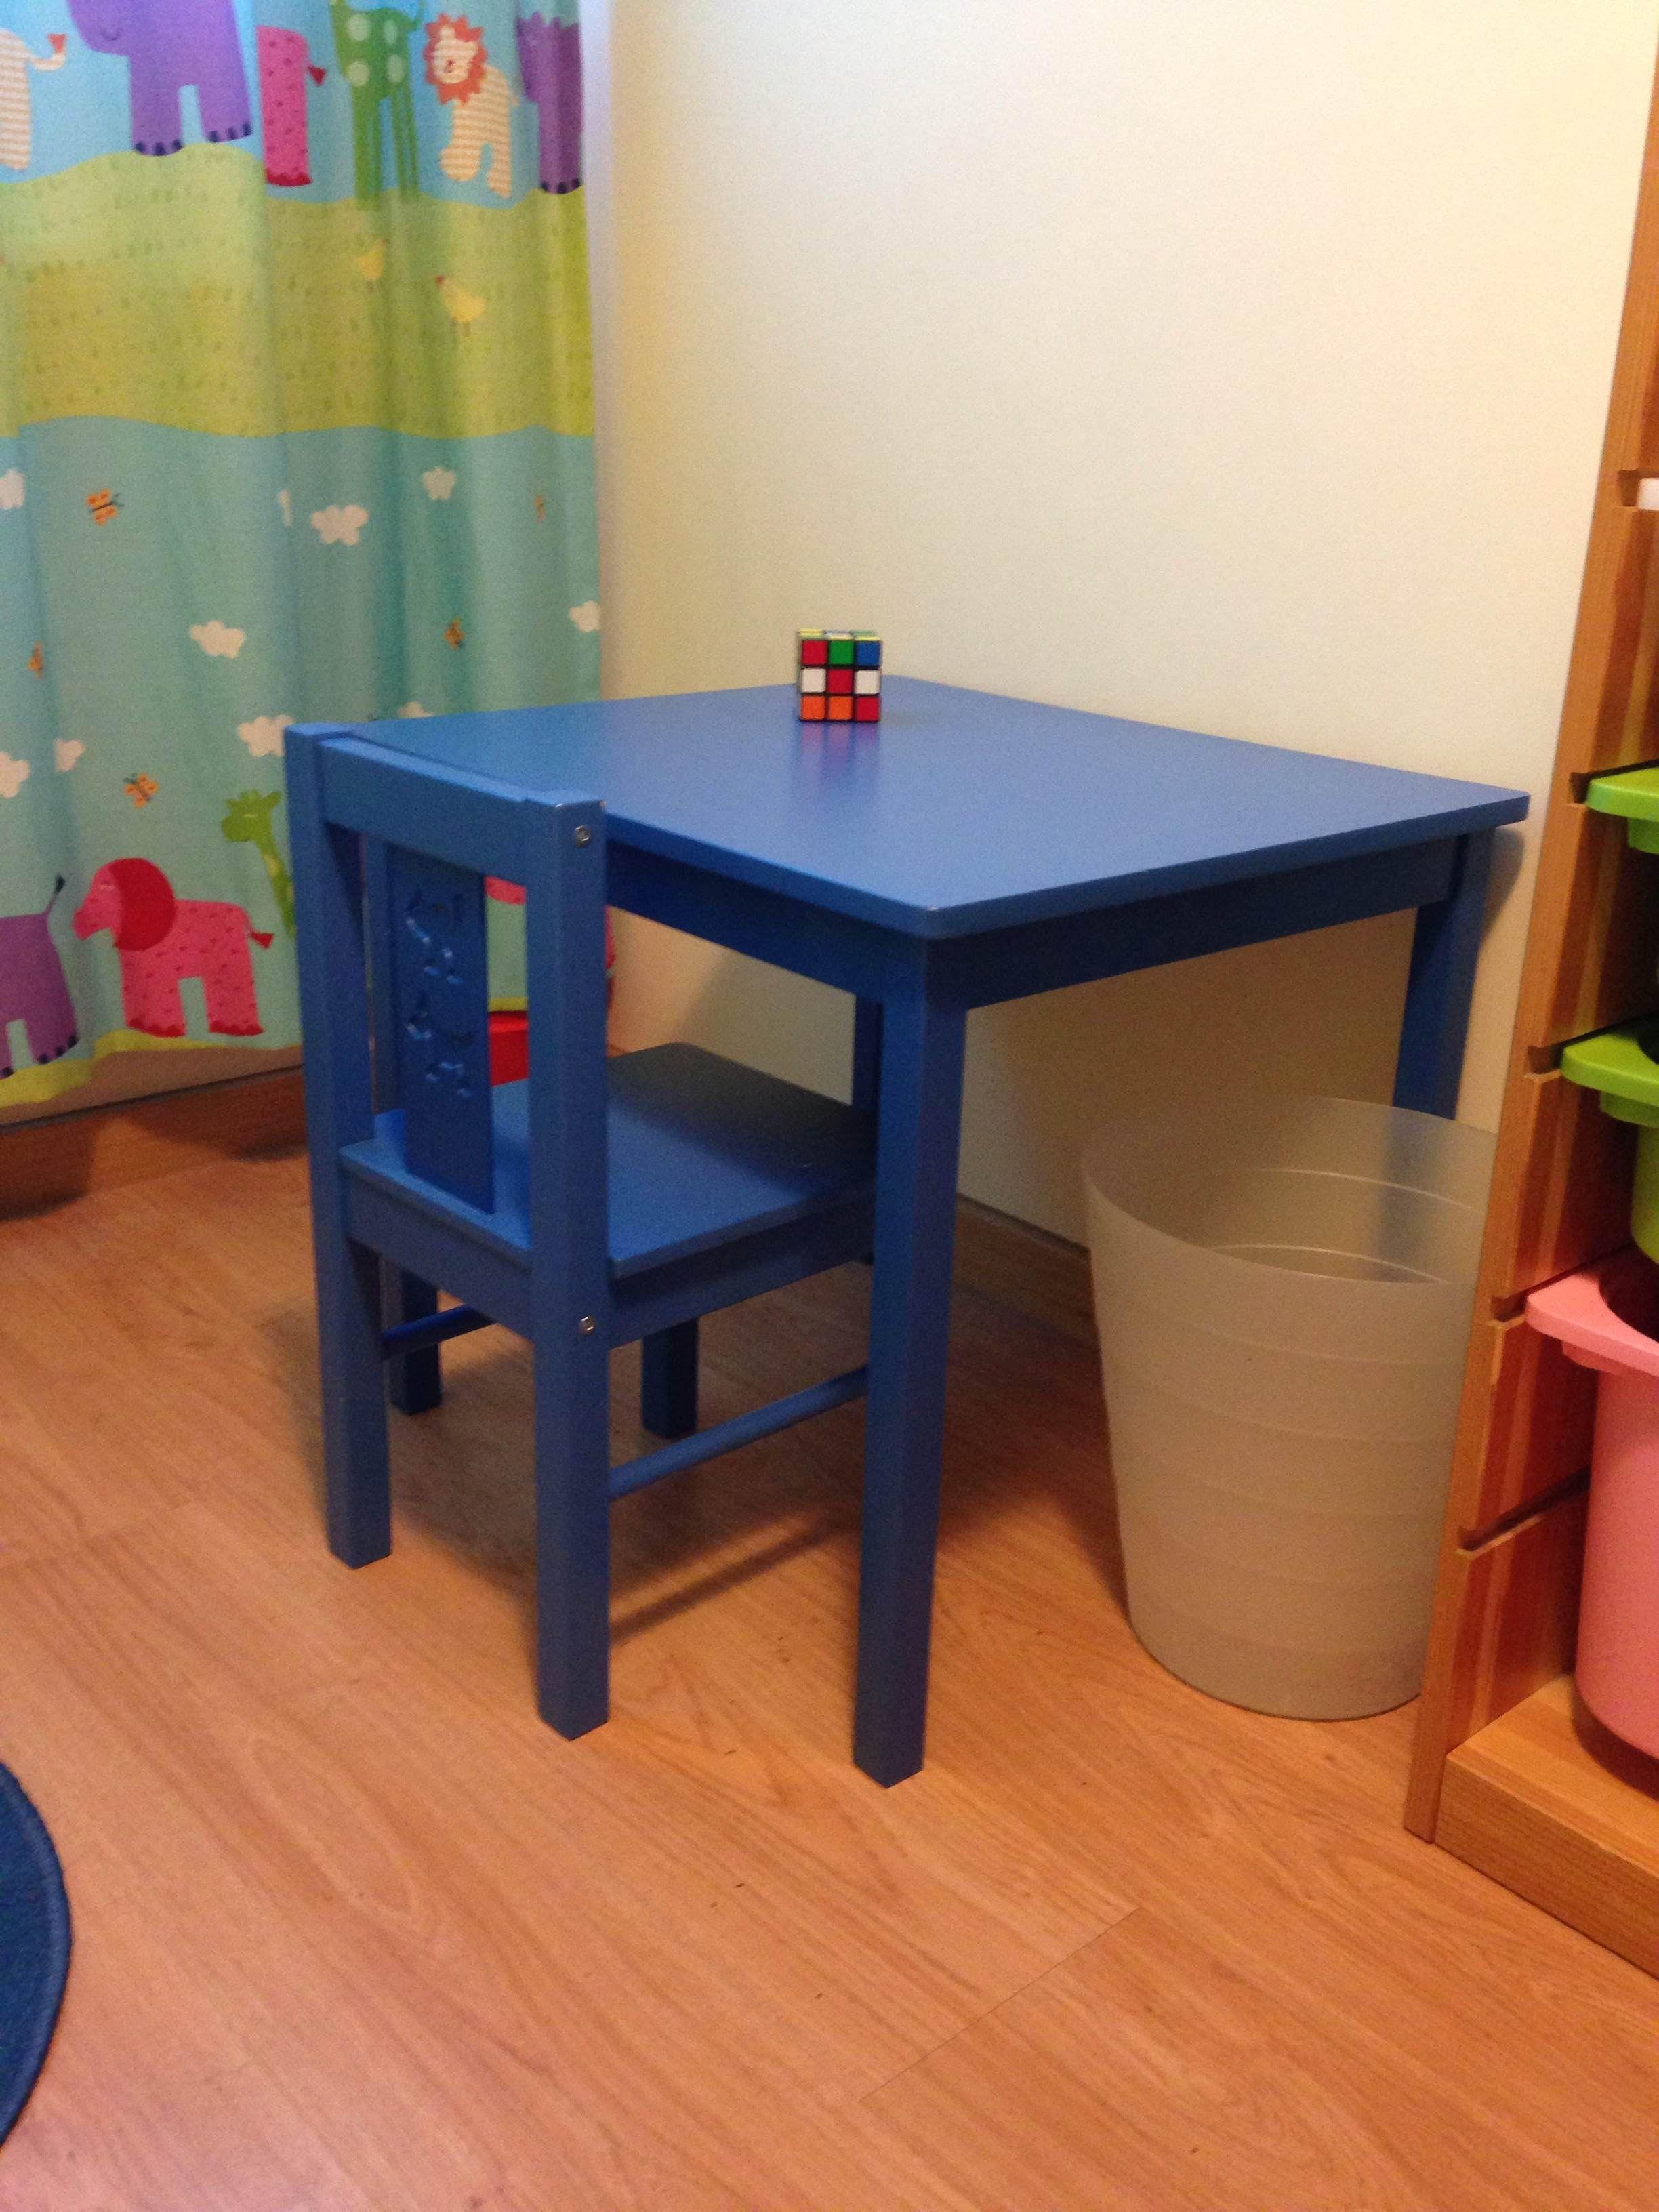 19 mesa y silla ikea kritter infantil 50cm de alto for Silla escritorio infantil ikea